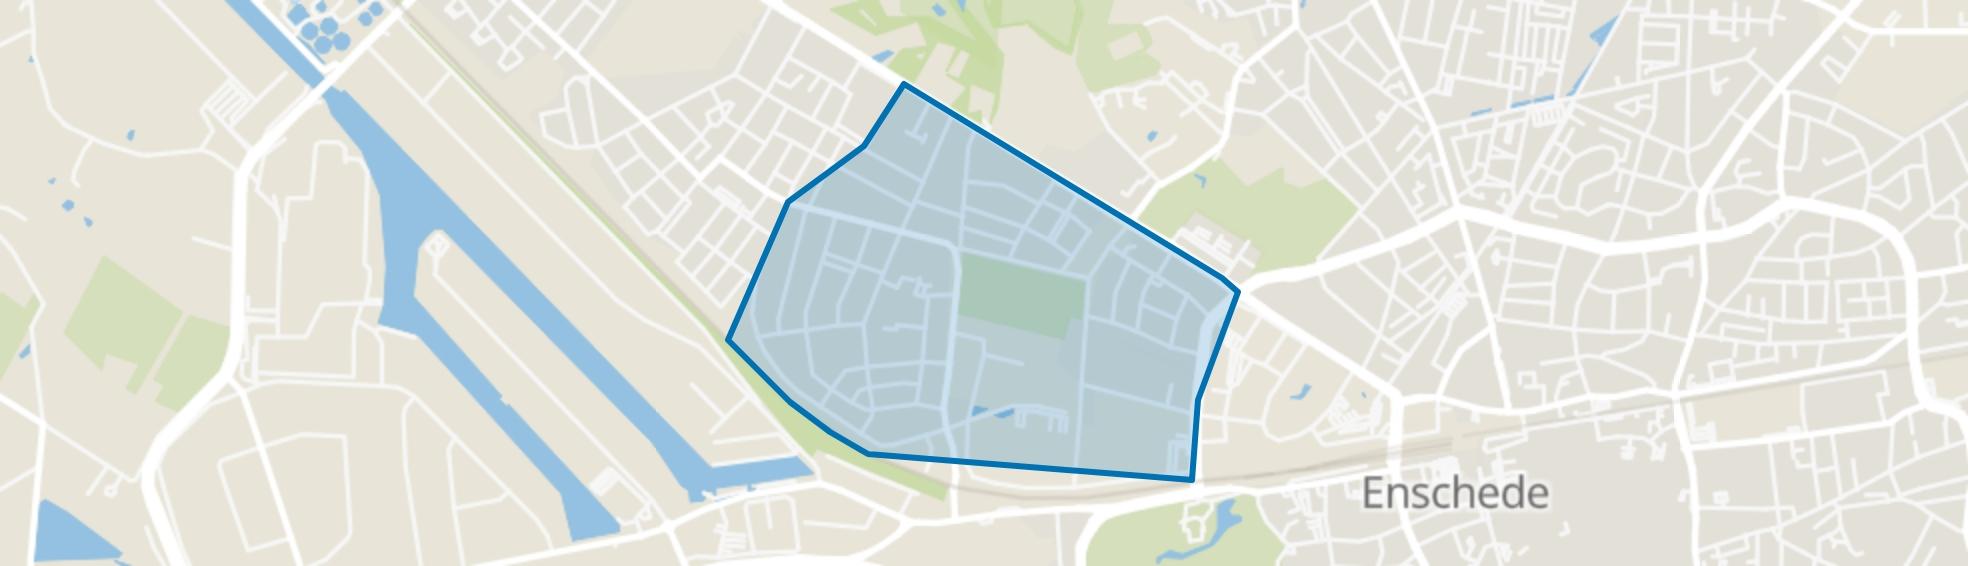 Tubantia-Toekomst, Enschede map